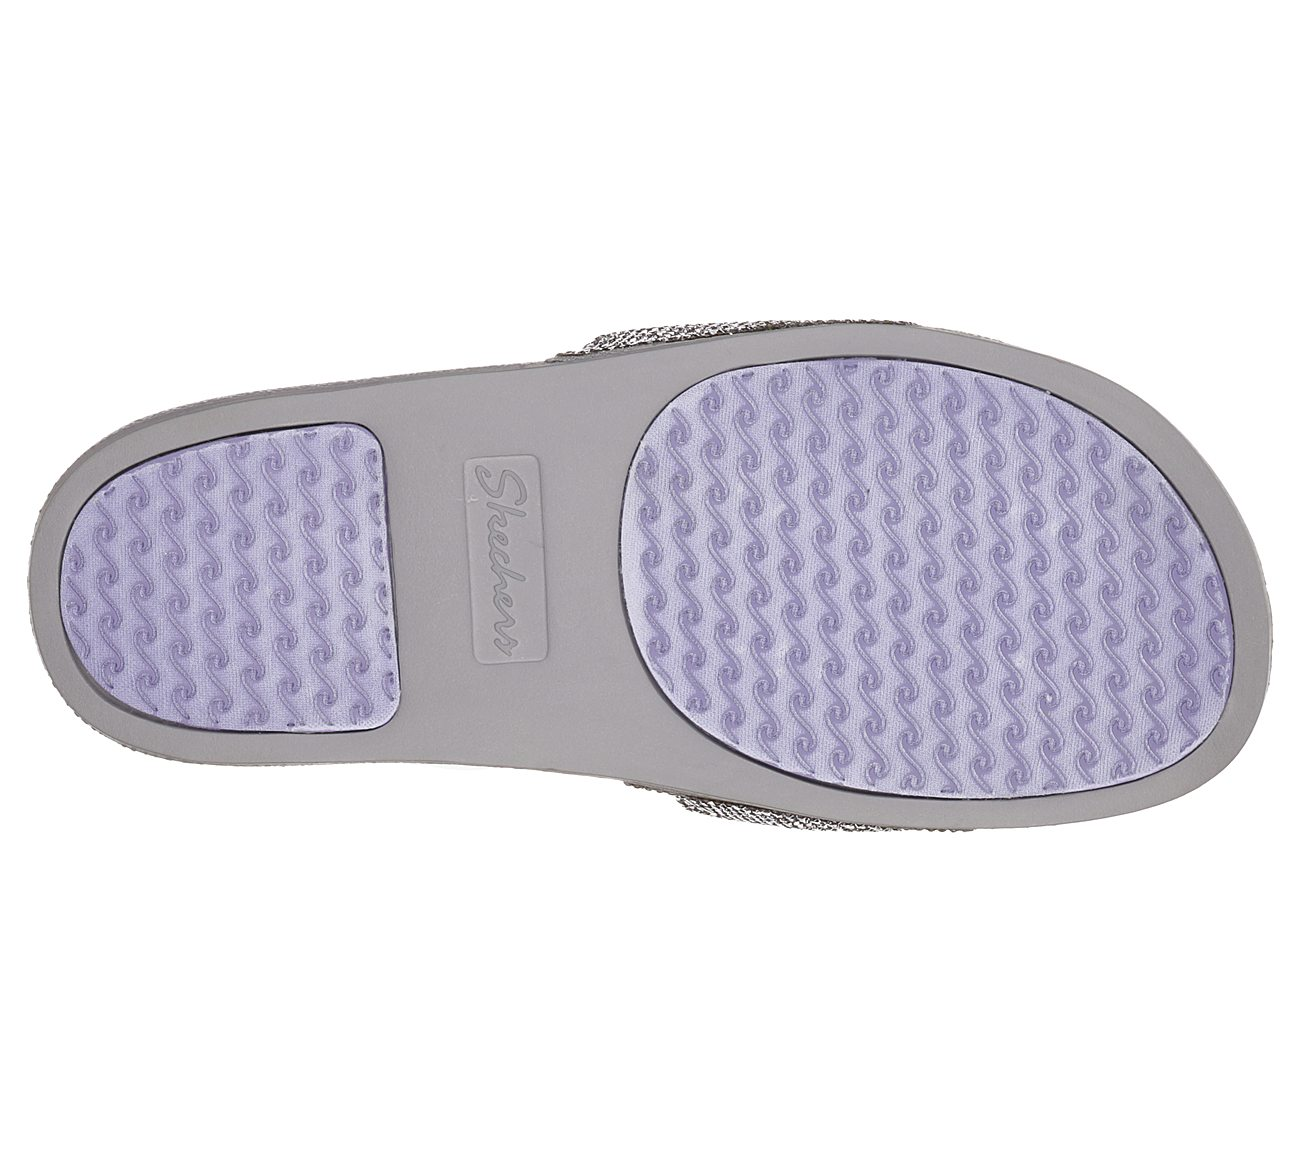 4b59d2a81d63 Buy SKECHERS Pop Ups - Stone Age Cali Shoes only $35.00